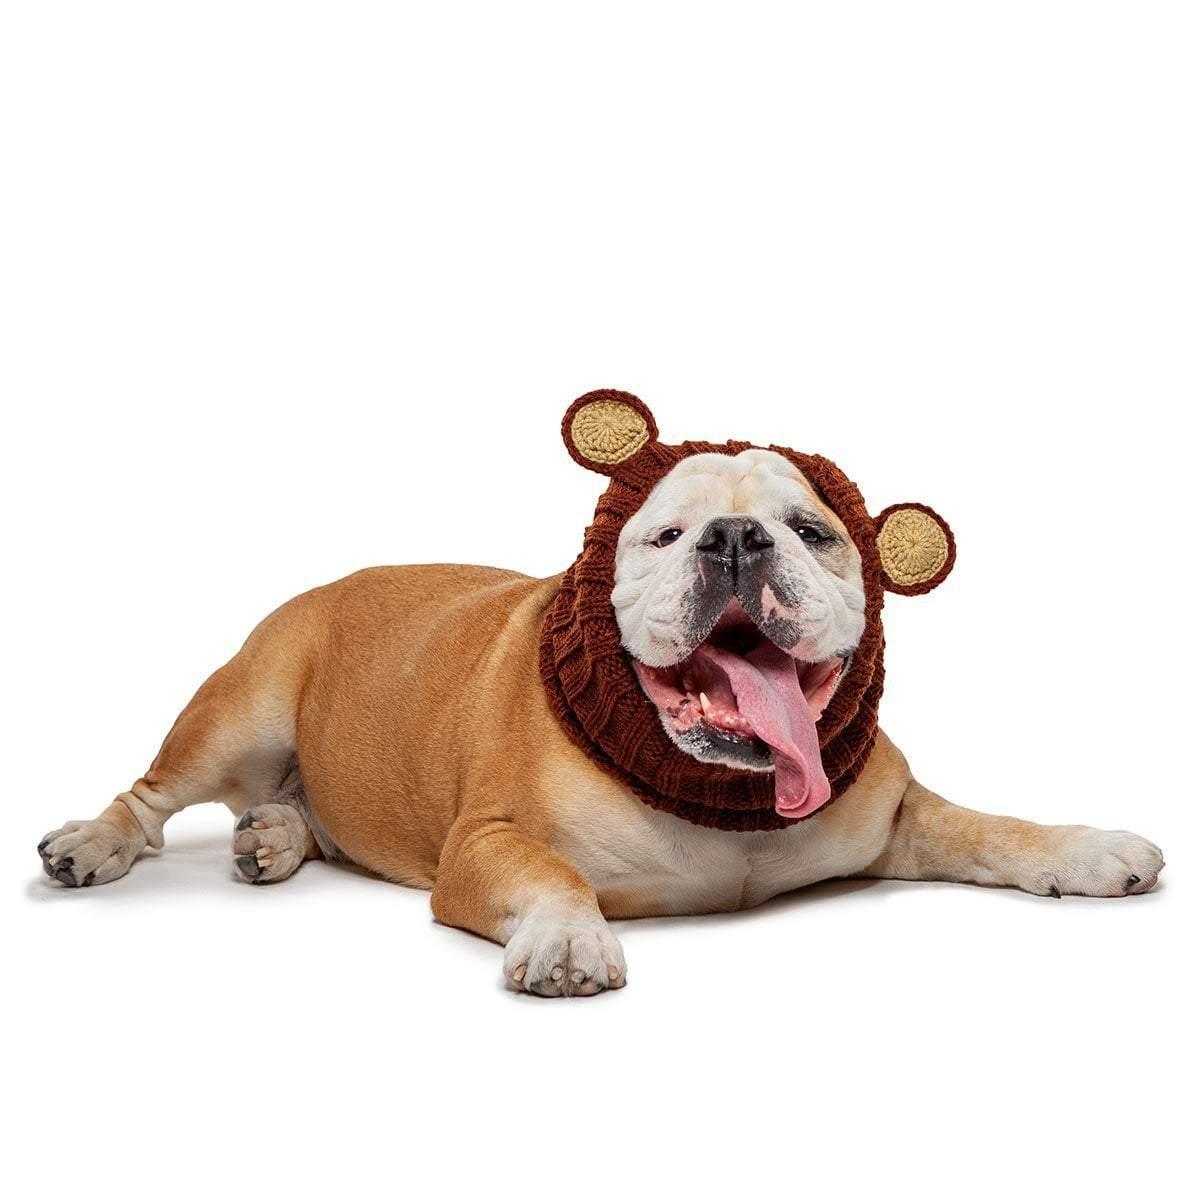 bull dog wearing a snood on his head that looks like teddy bear ears